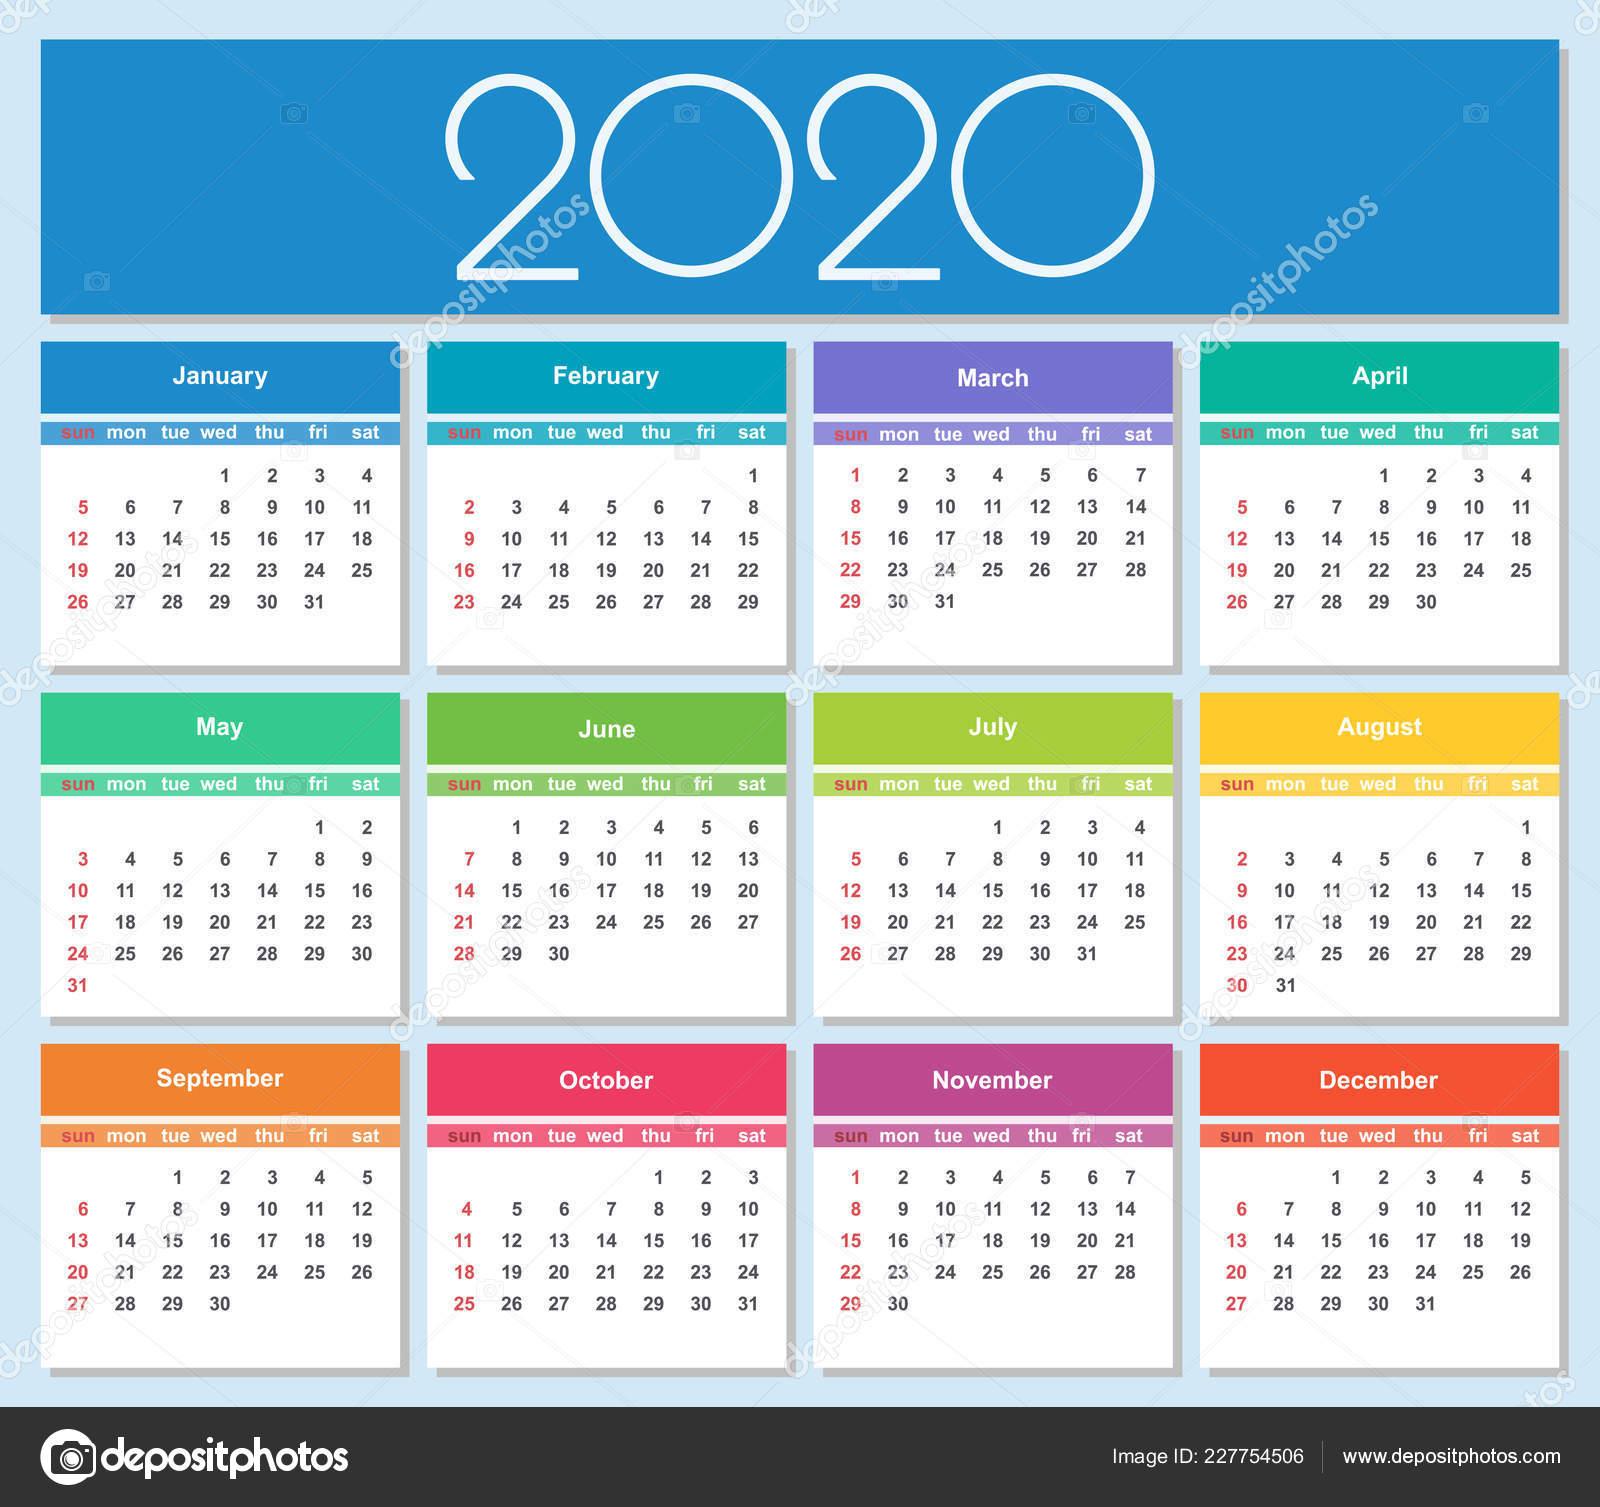 Calendar 2020.Colorful Year 2020 Calendar Simple Vector Template Isolated